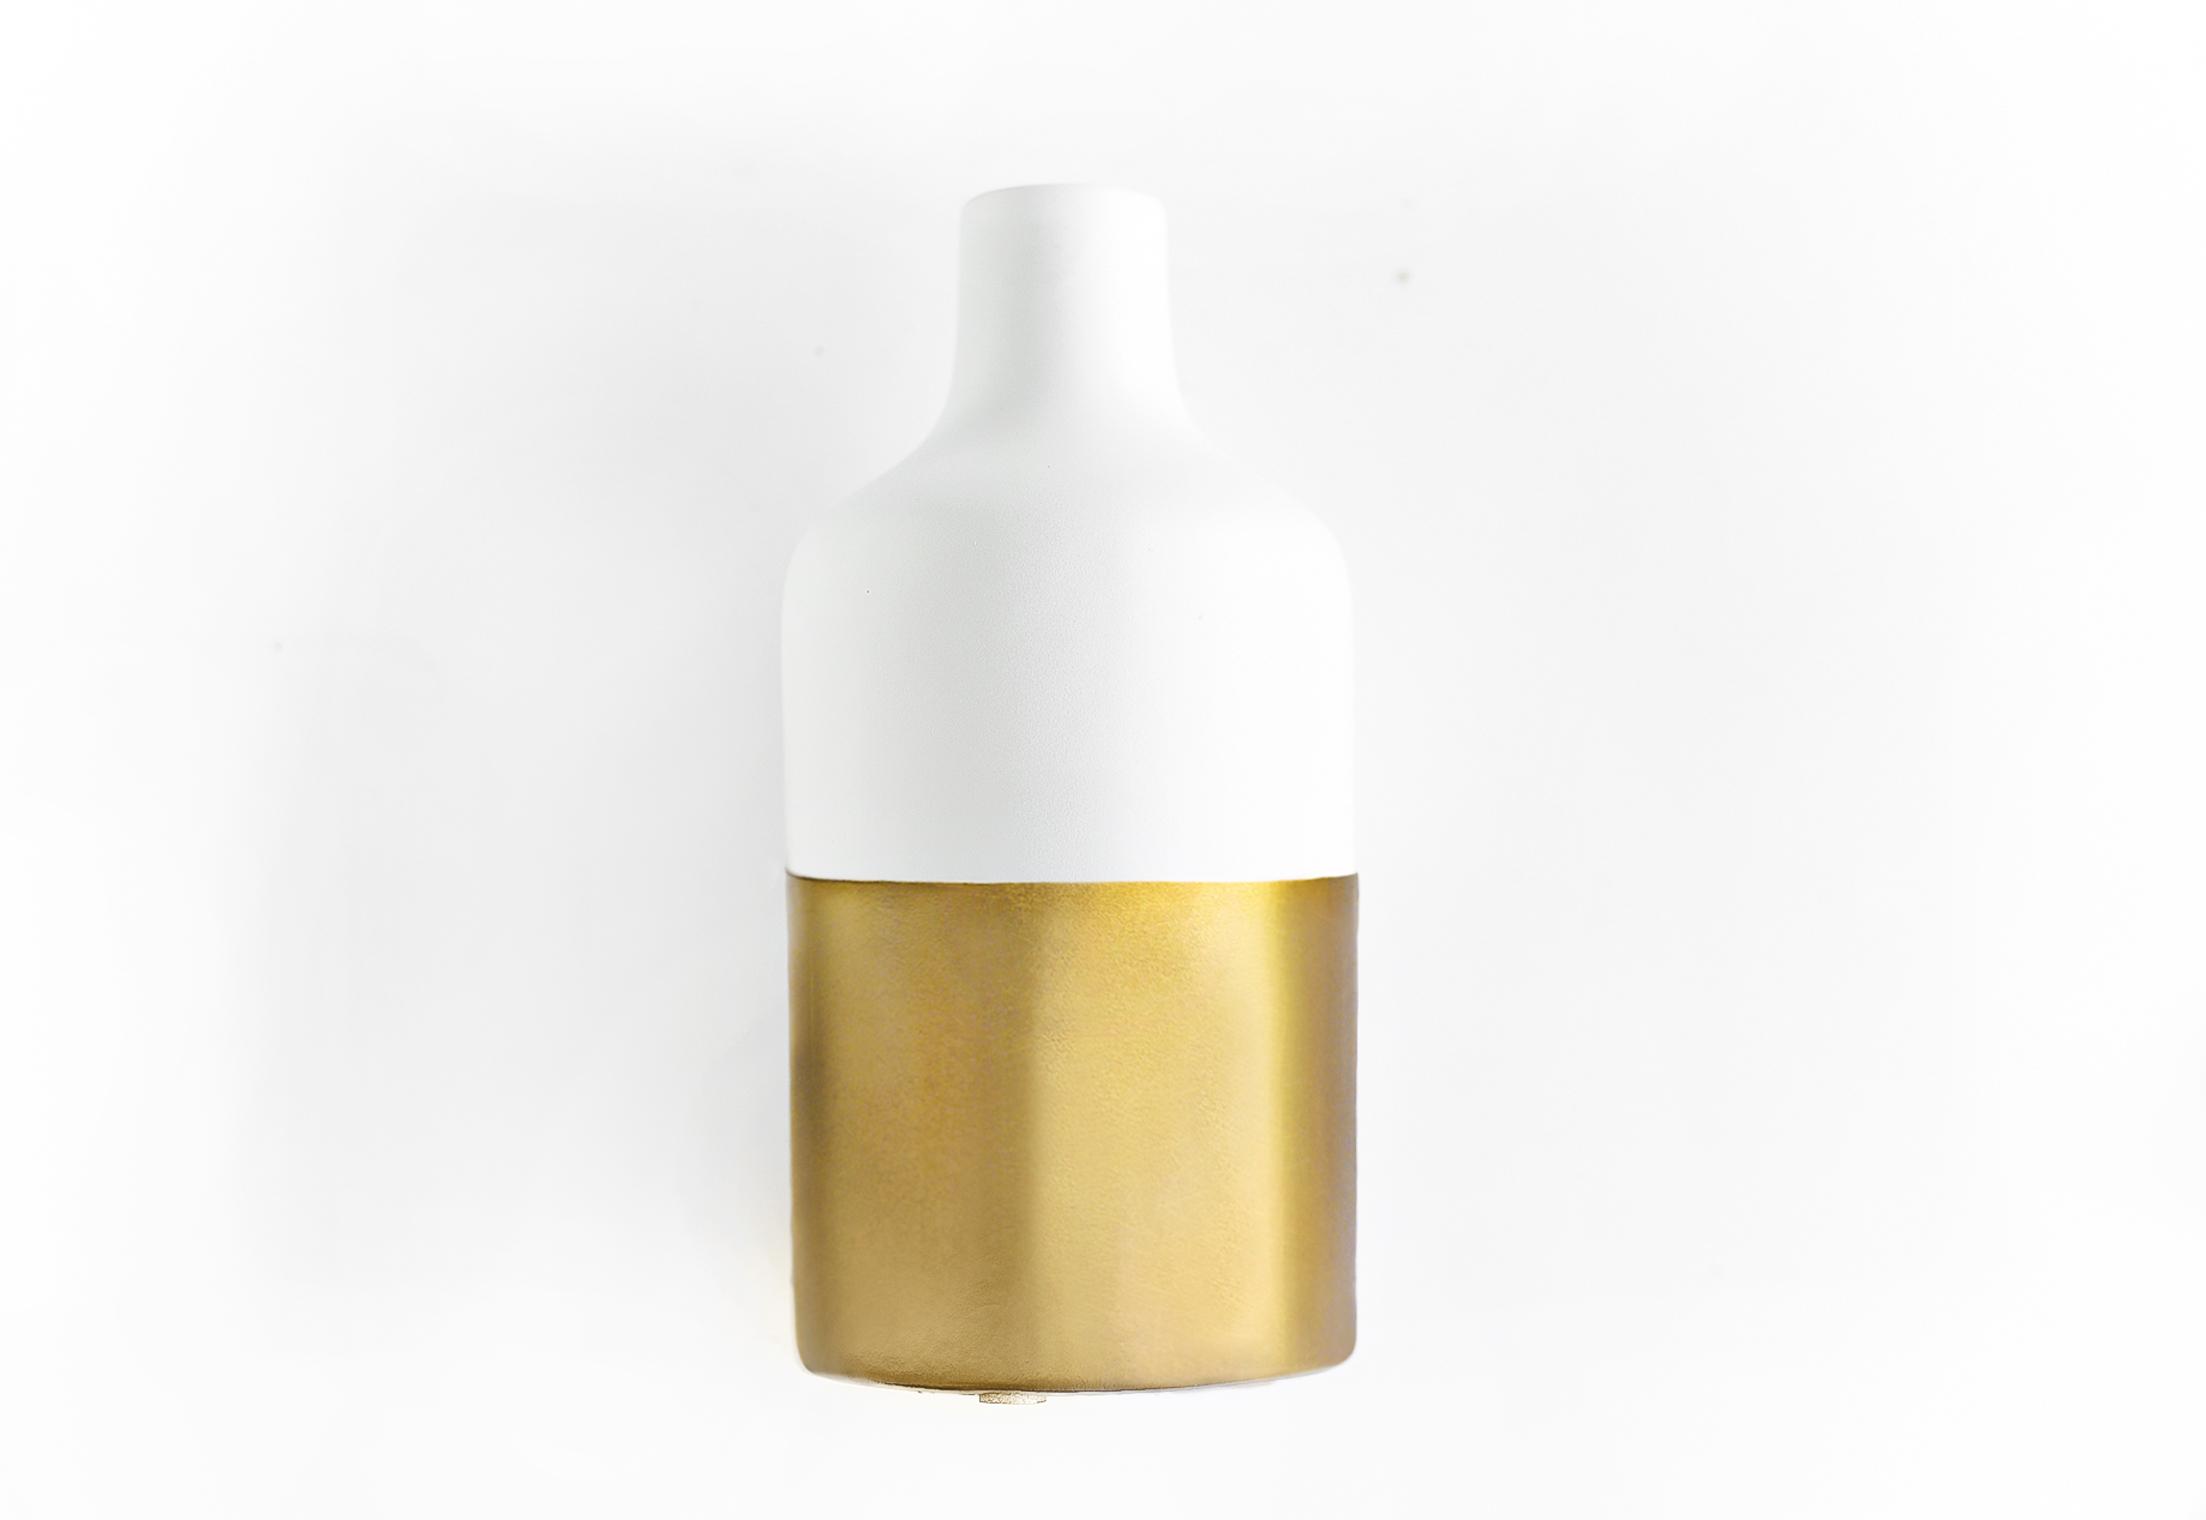 DIY Gold-Dipped Bouquet Vase